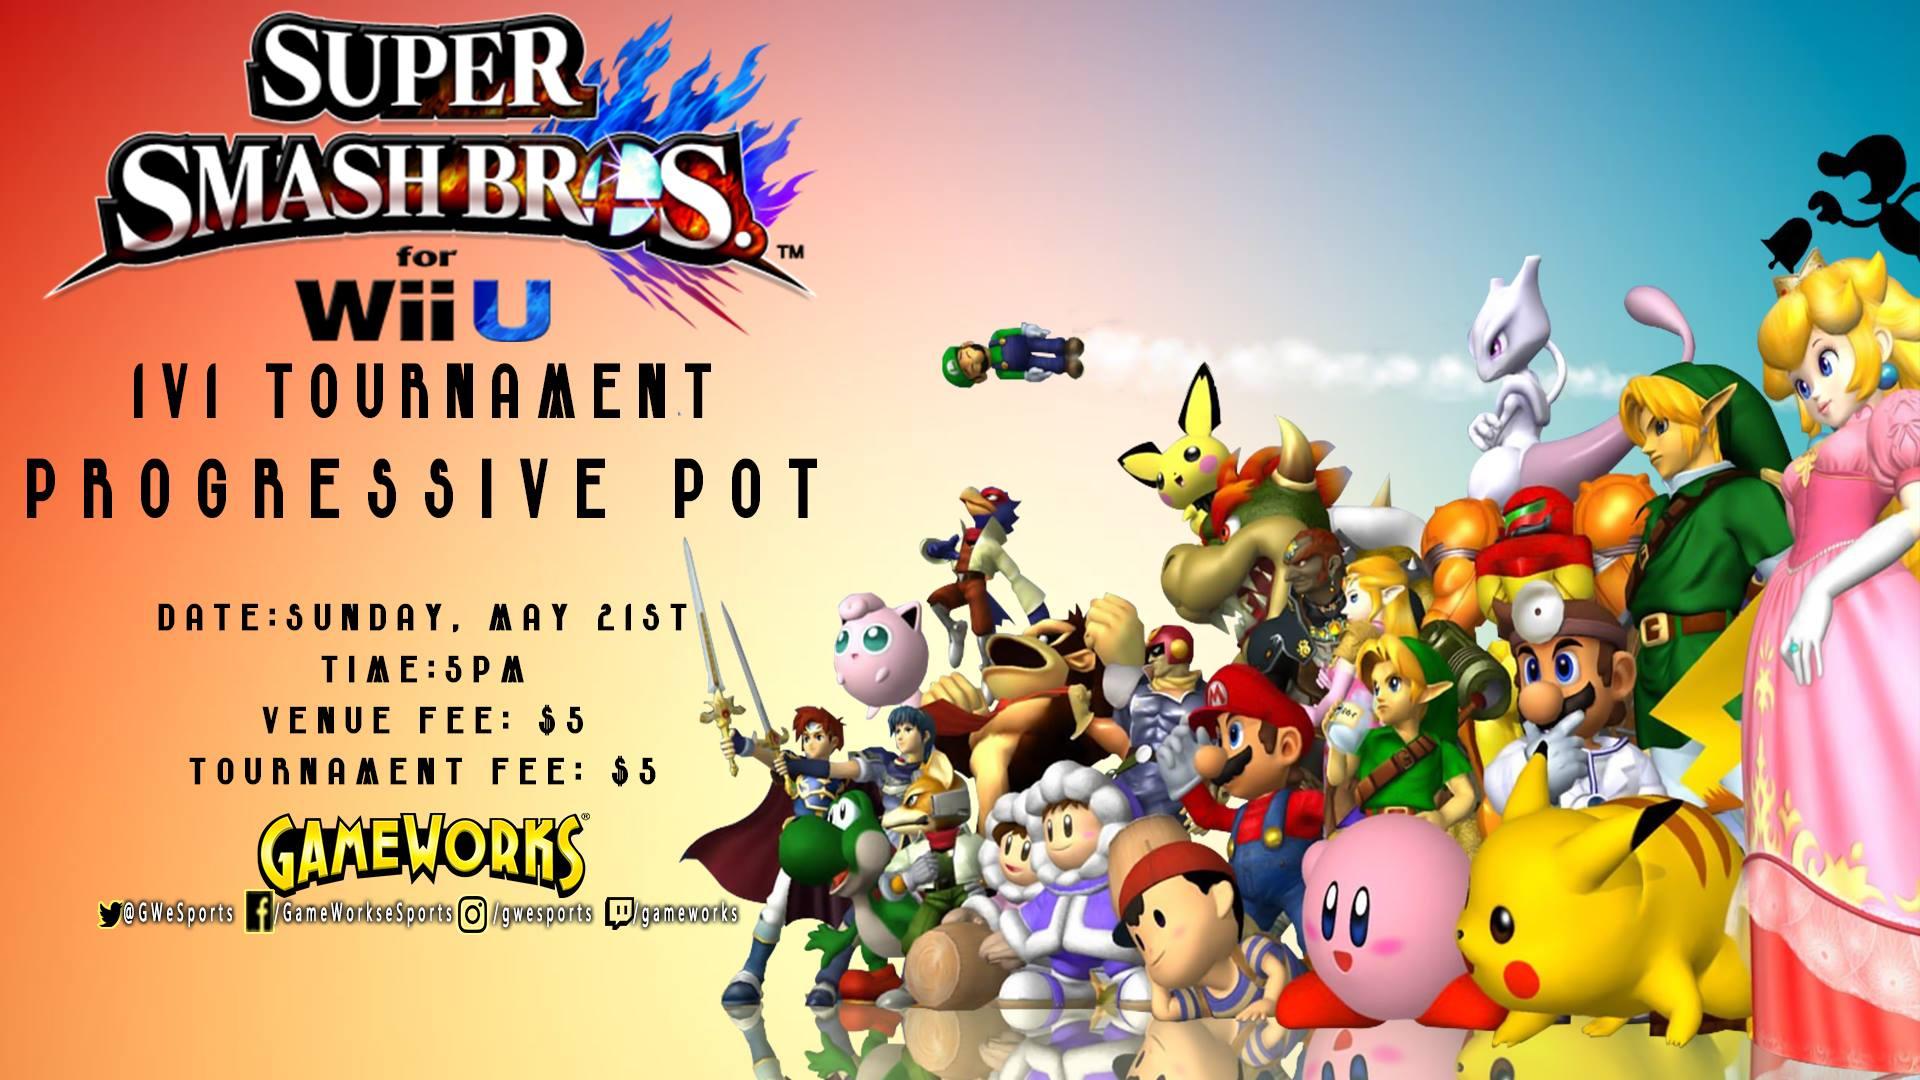 $150 Bonus 1v1 Super Smash Tournament WiiU | Esports in Las Vegas